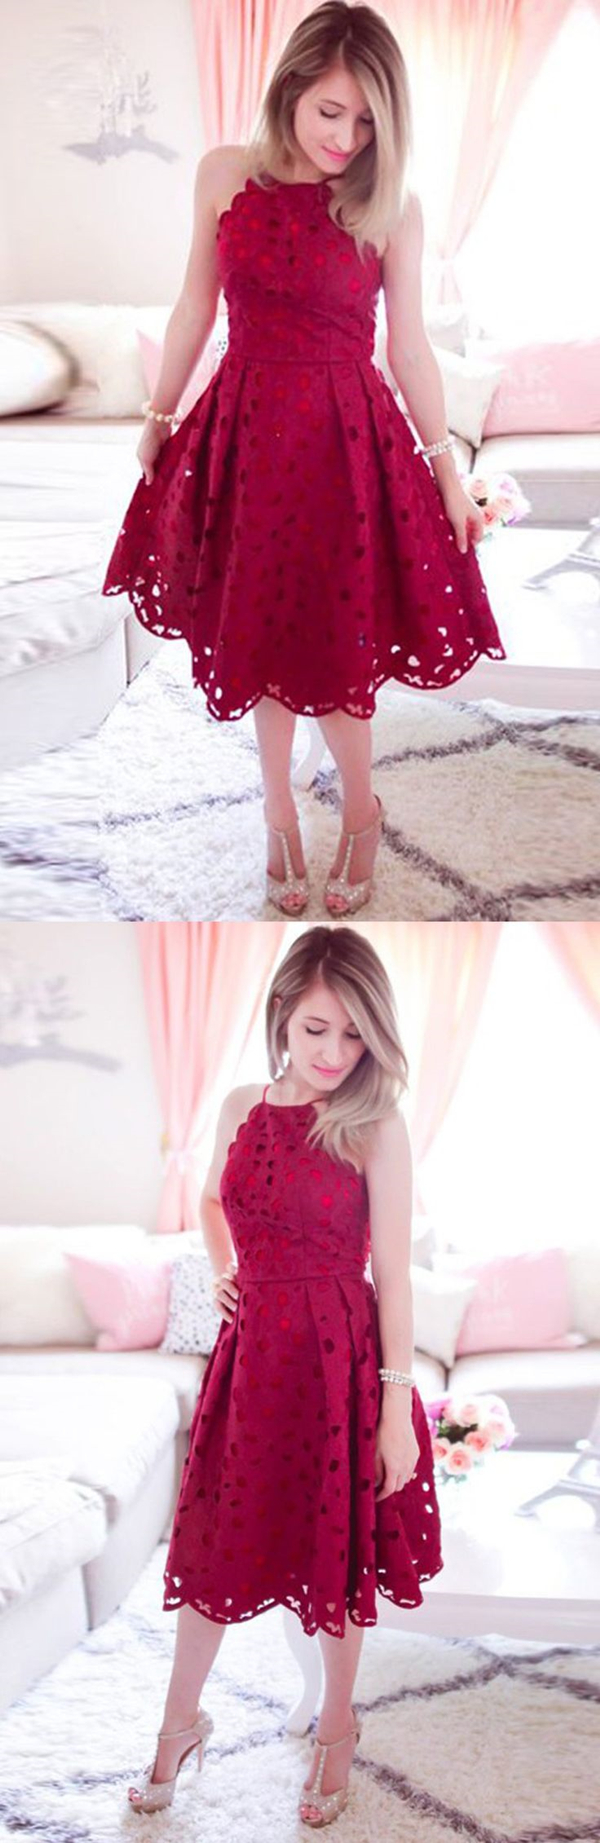 Aline halter kneelength burgundy sleeveless lace homecoming dress